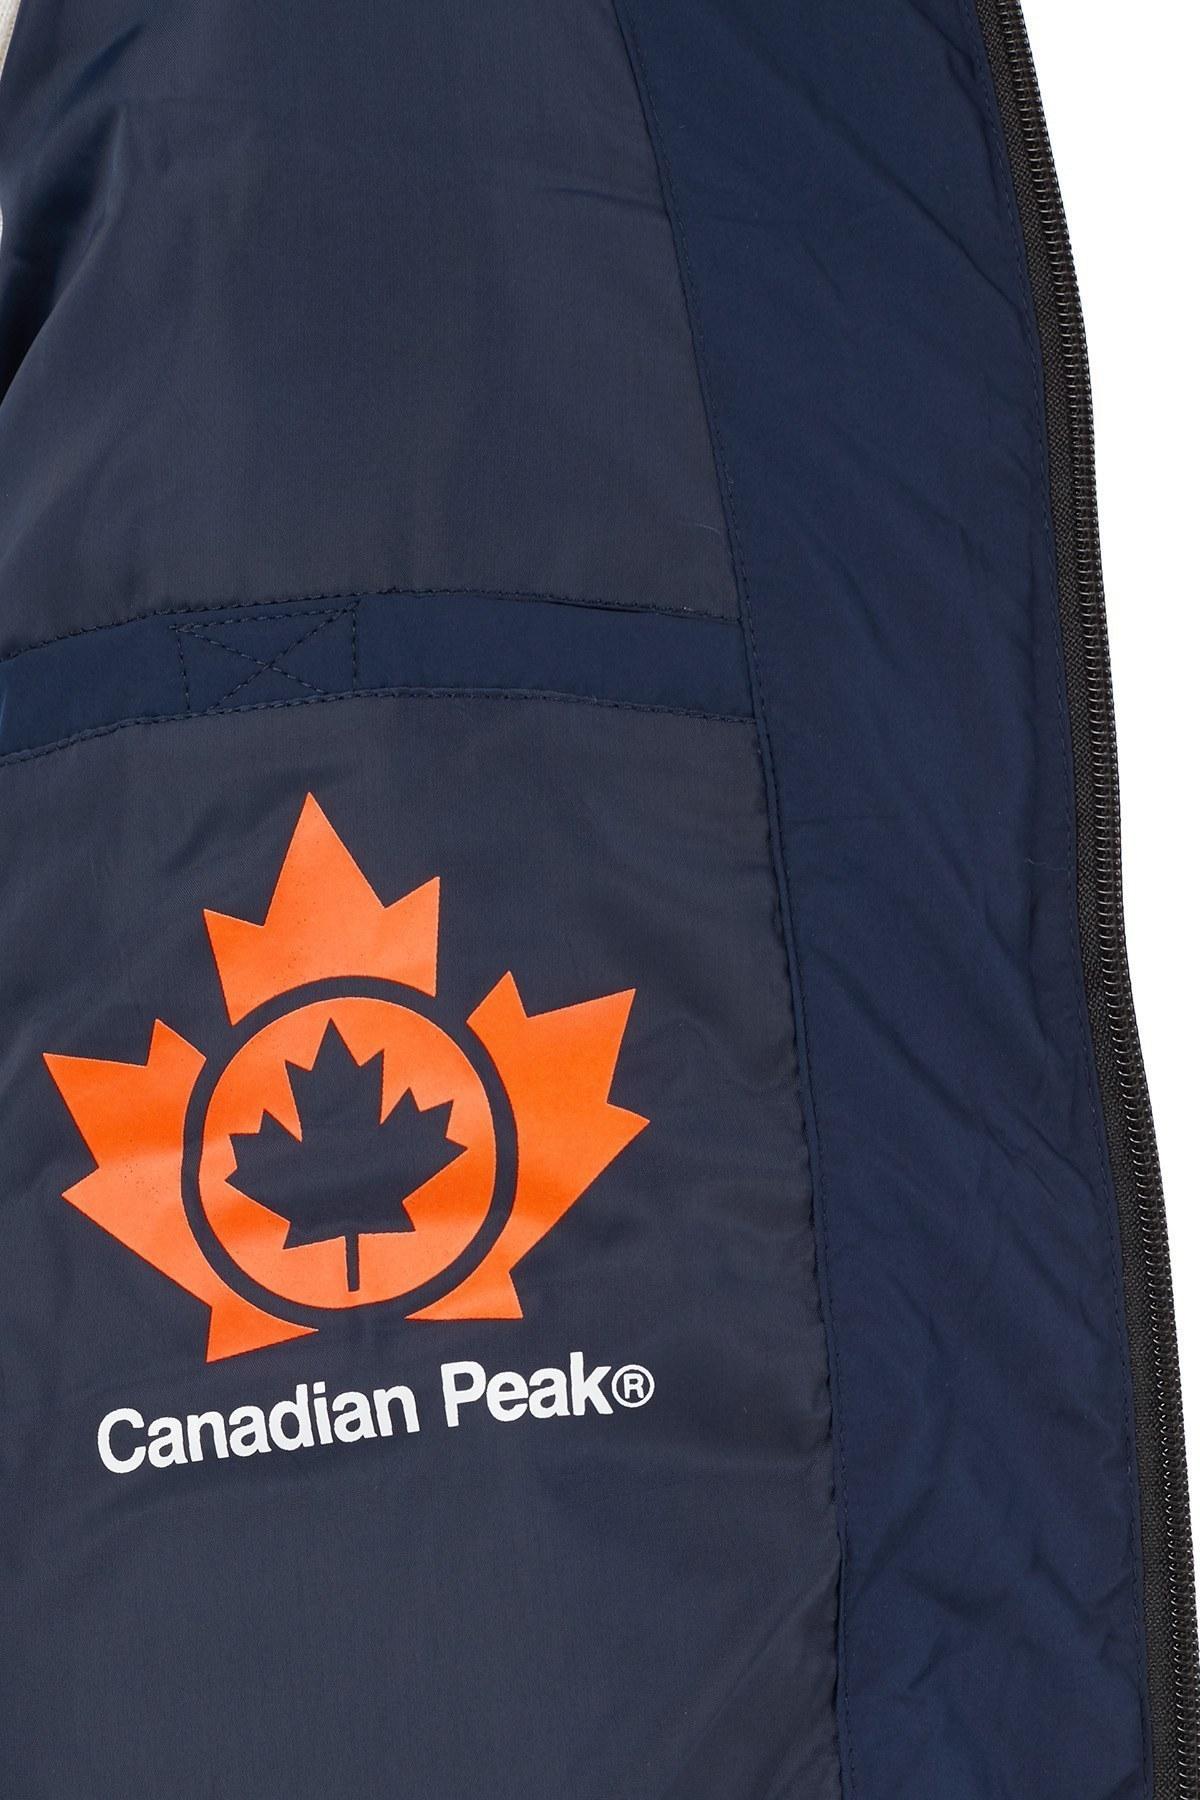 Canadian Peak Kapüşonlu Outdoor Erkek Parka ARDENT LACİVERT